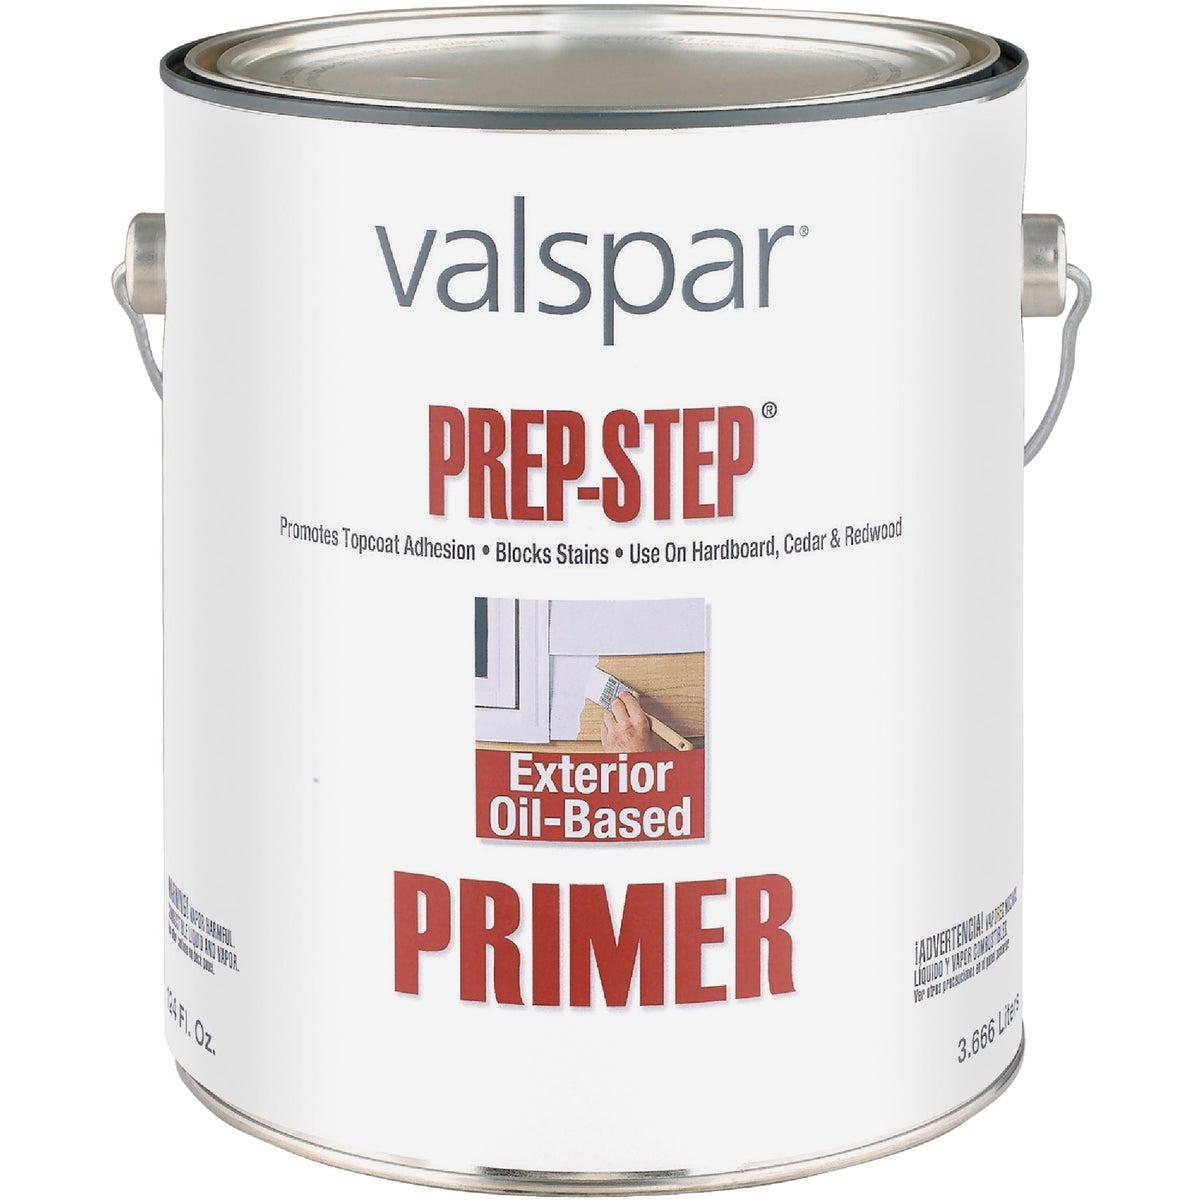 EXTERIOR OIL PRIMER - 044.0000983.007 by Valspar Corp